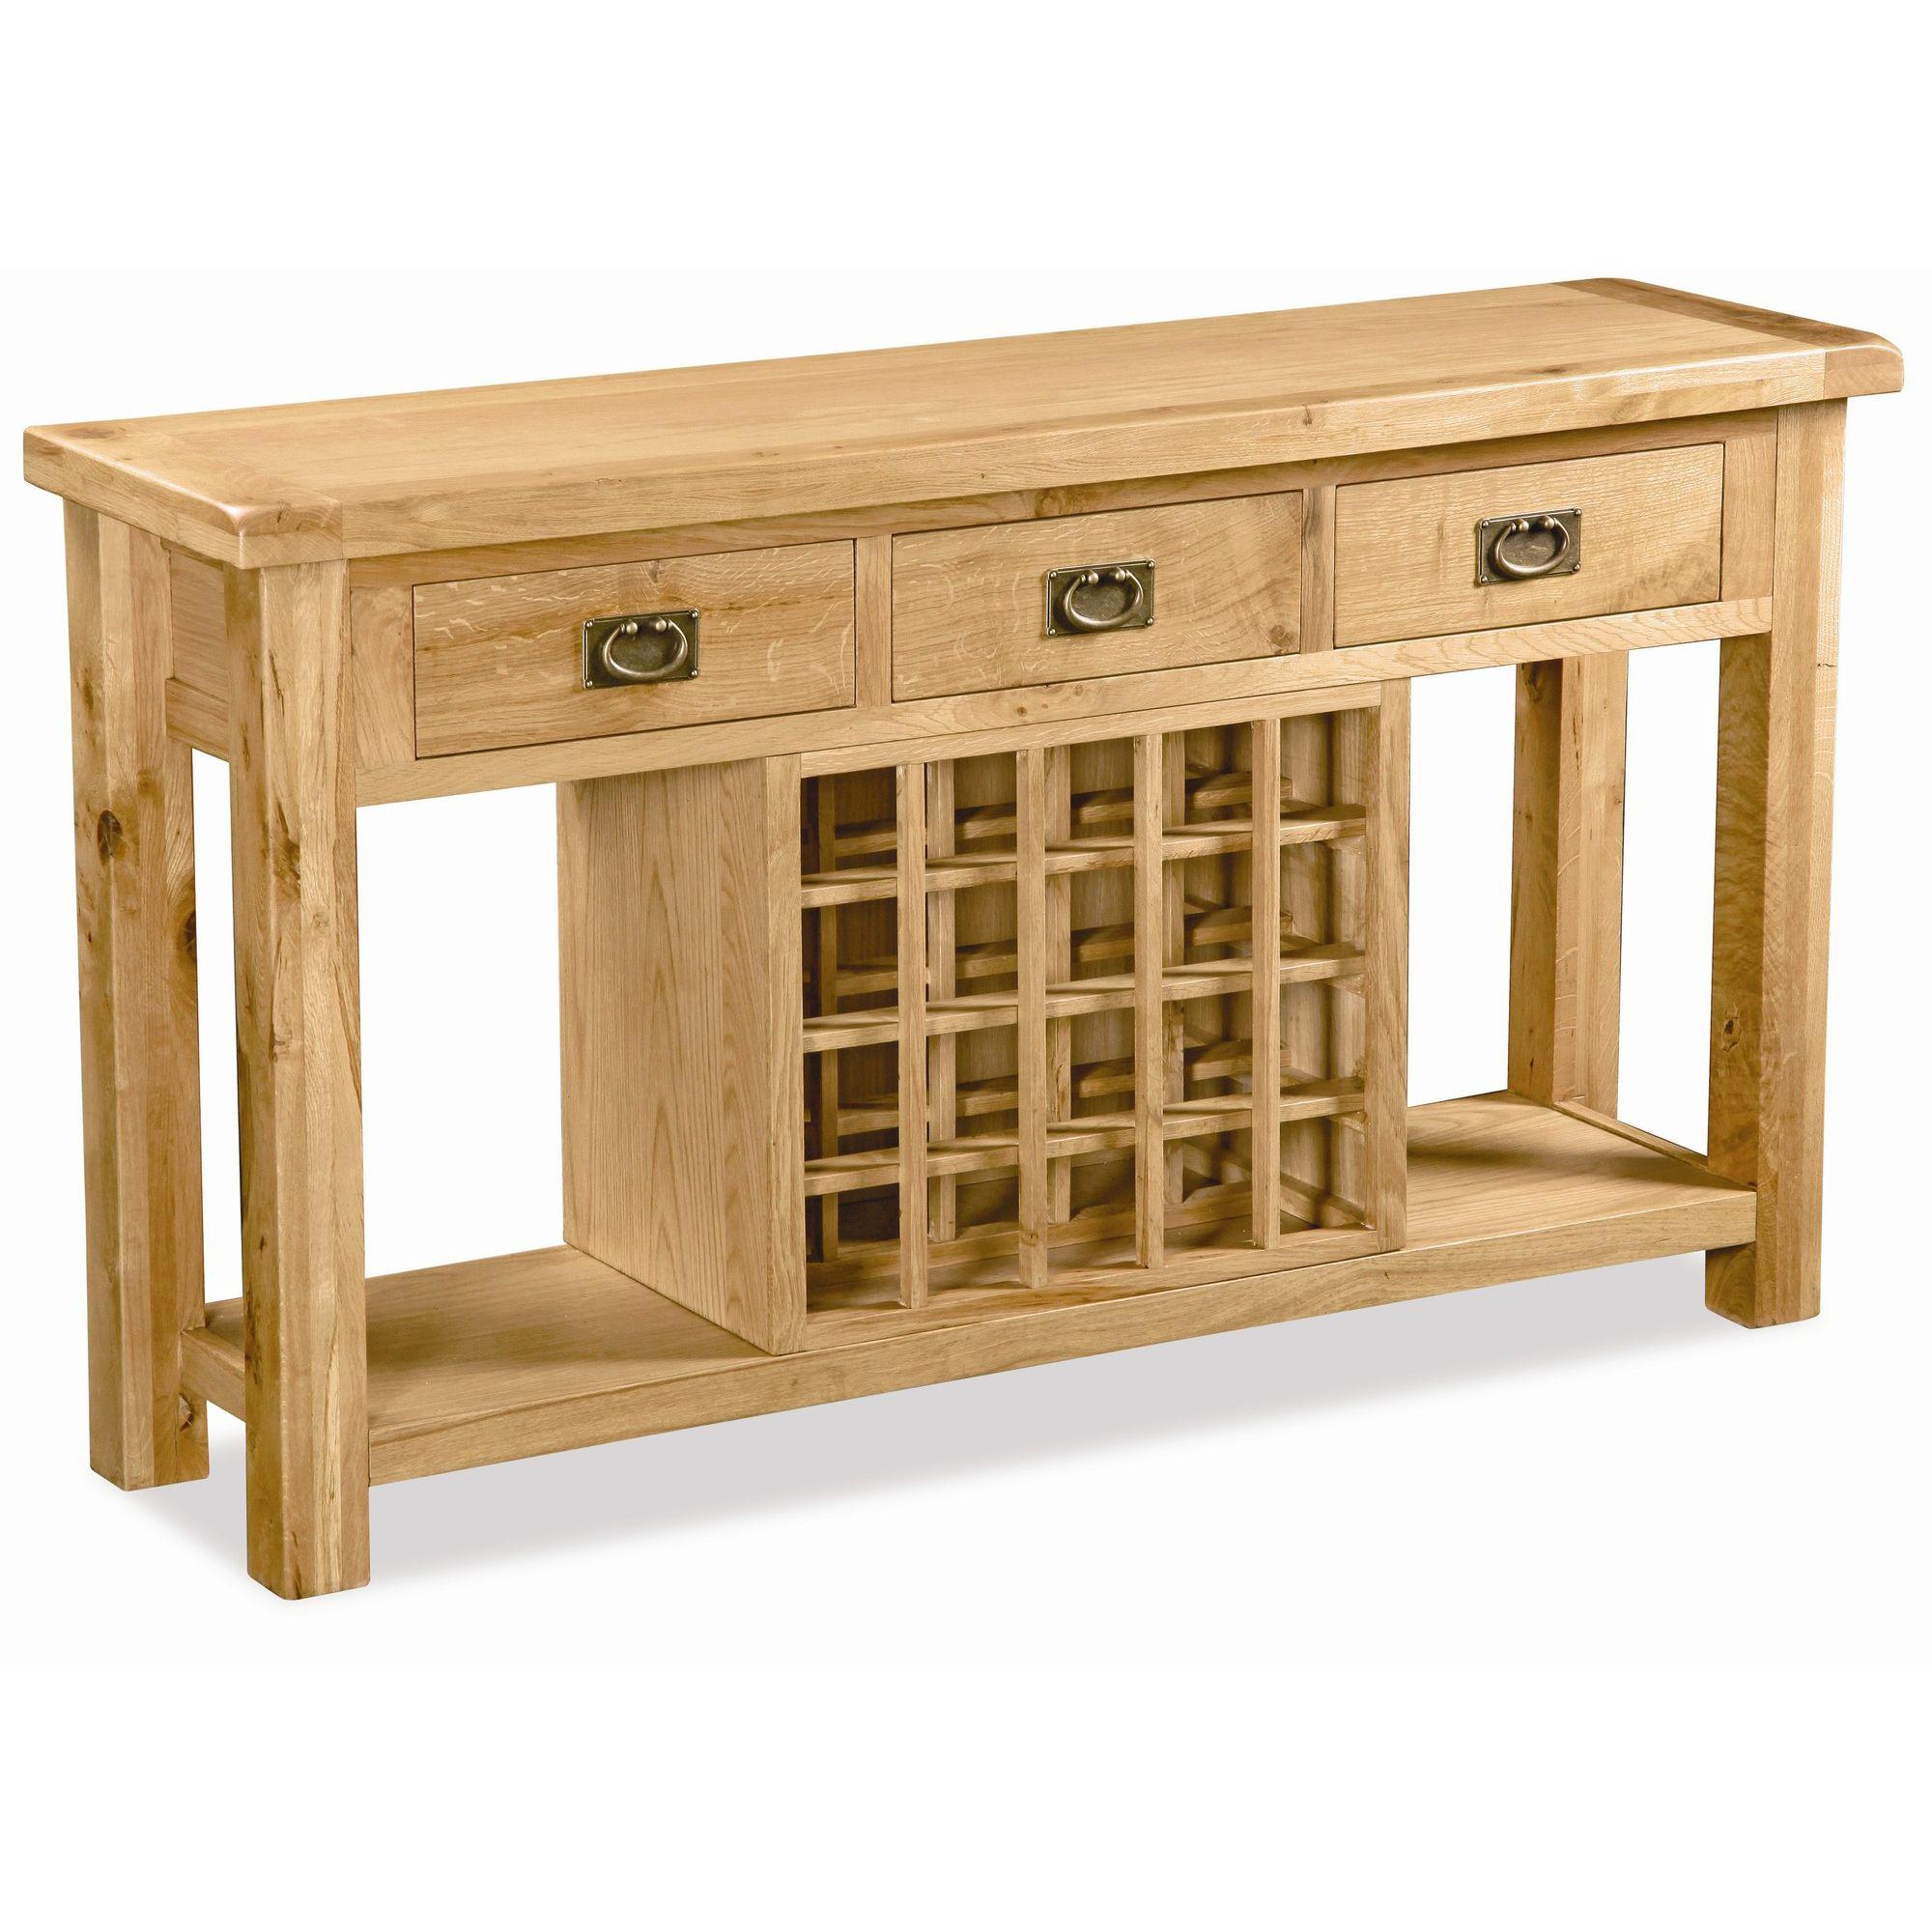 Alterton Furniture Pemberley Open Sideboard at Tesco Direct